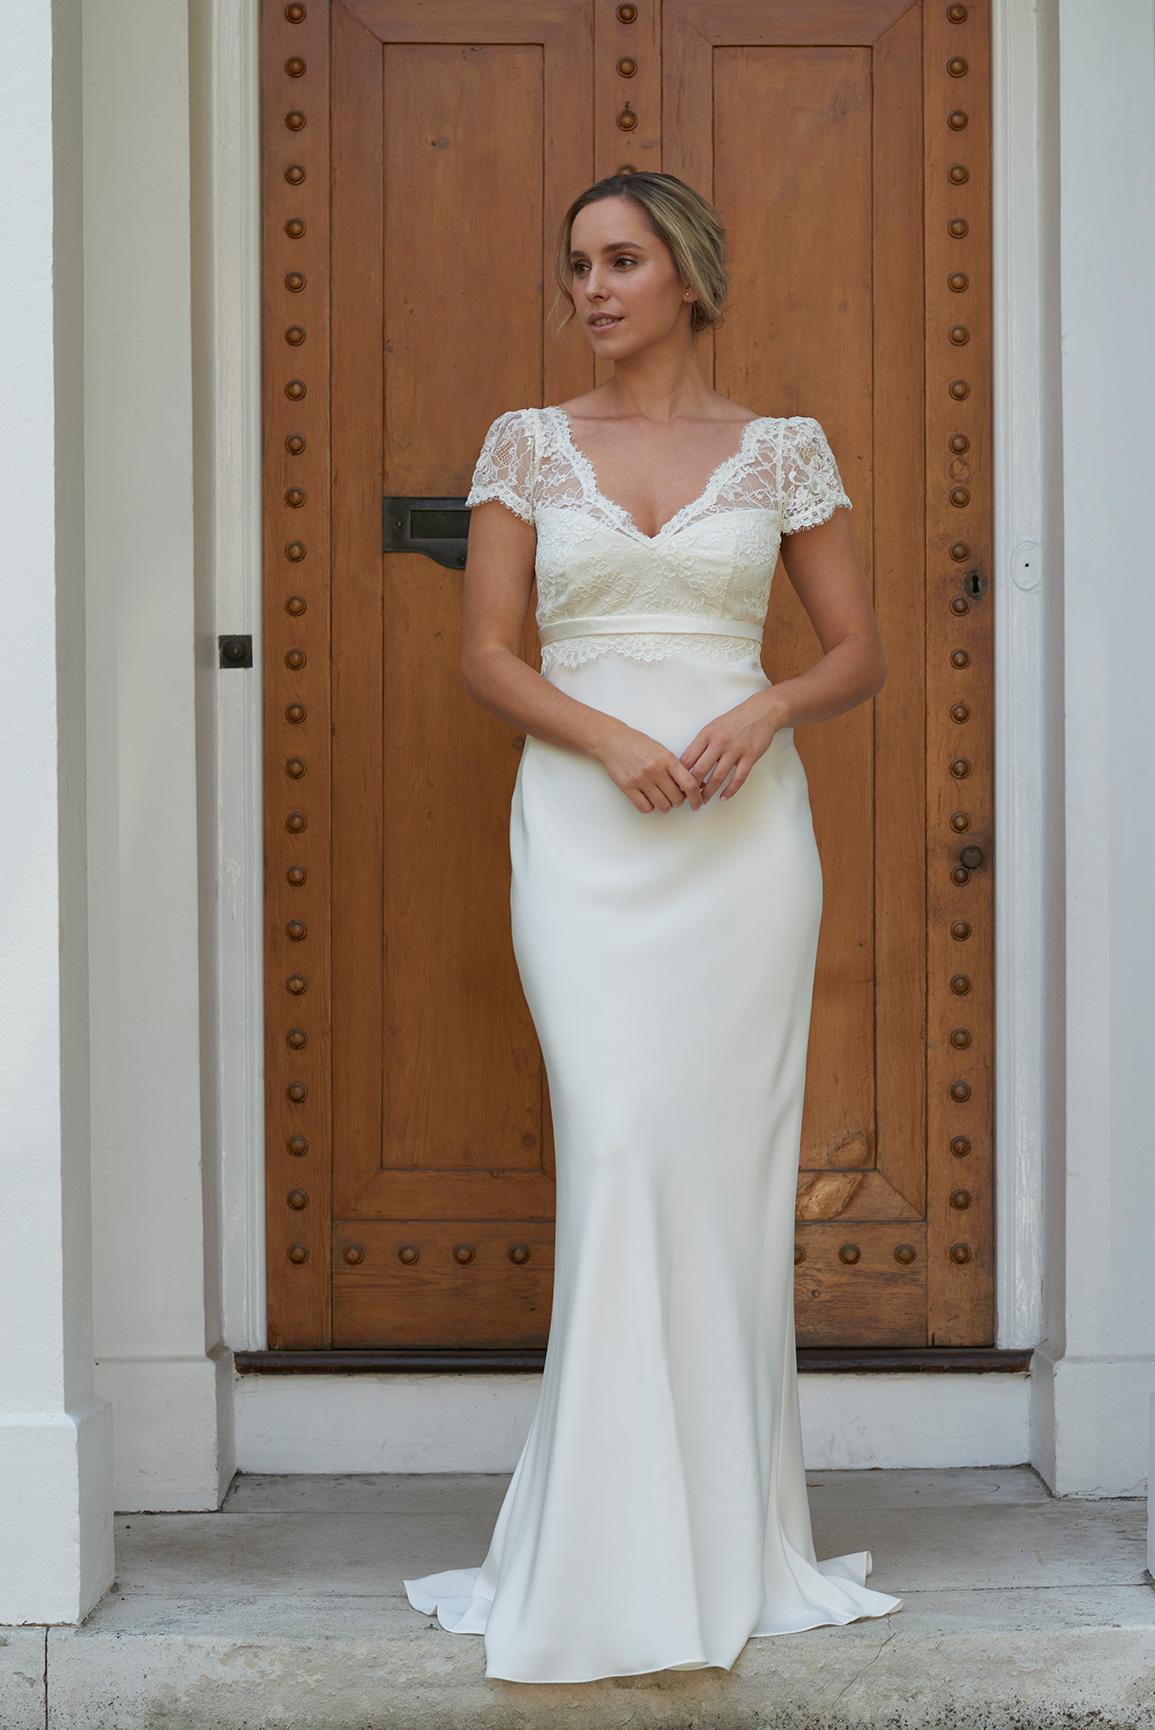 Lottie_dress_doorfront-web.jpg